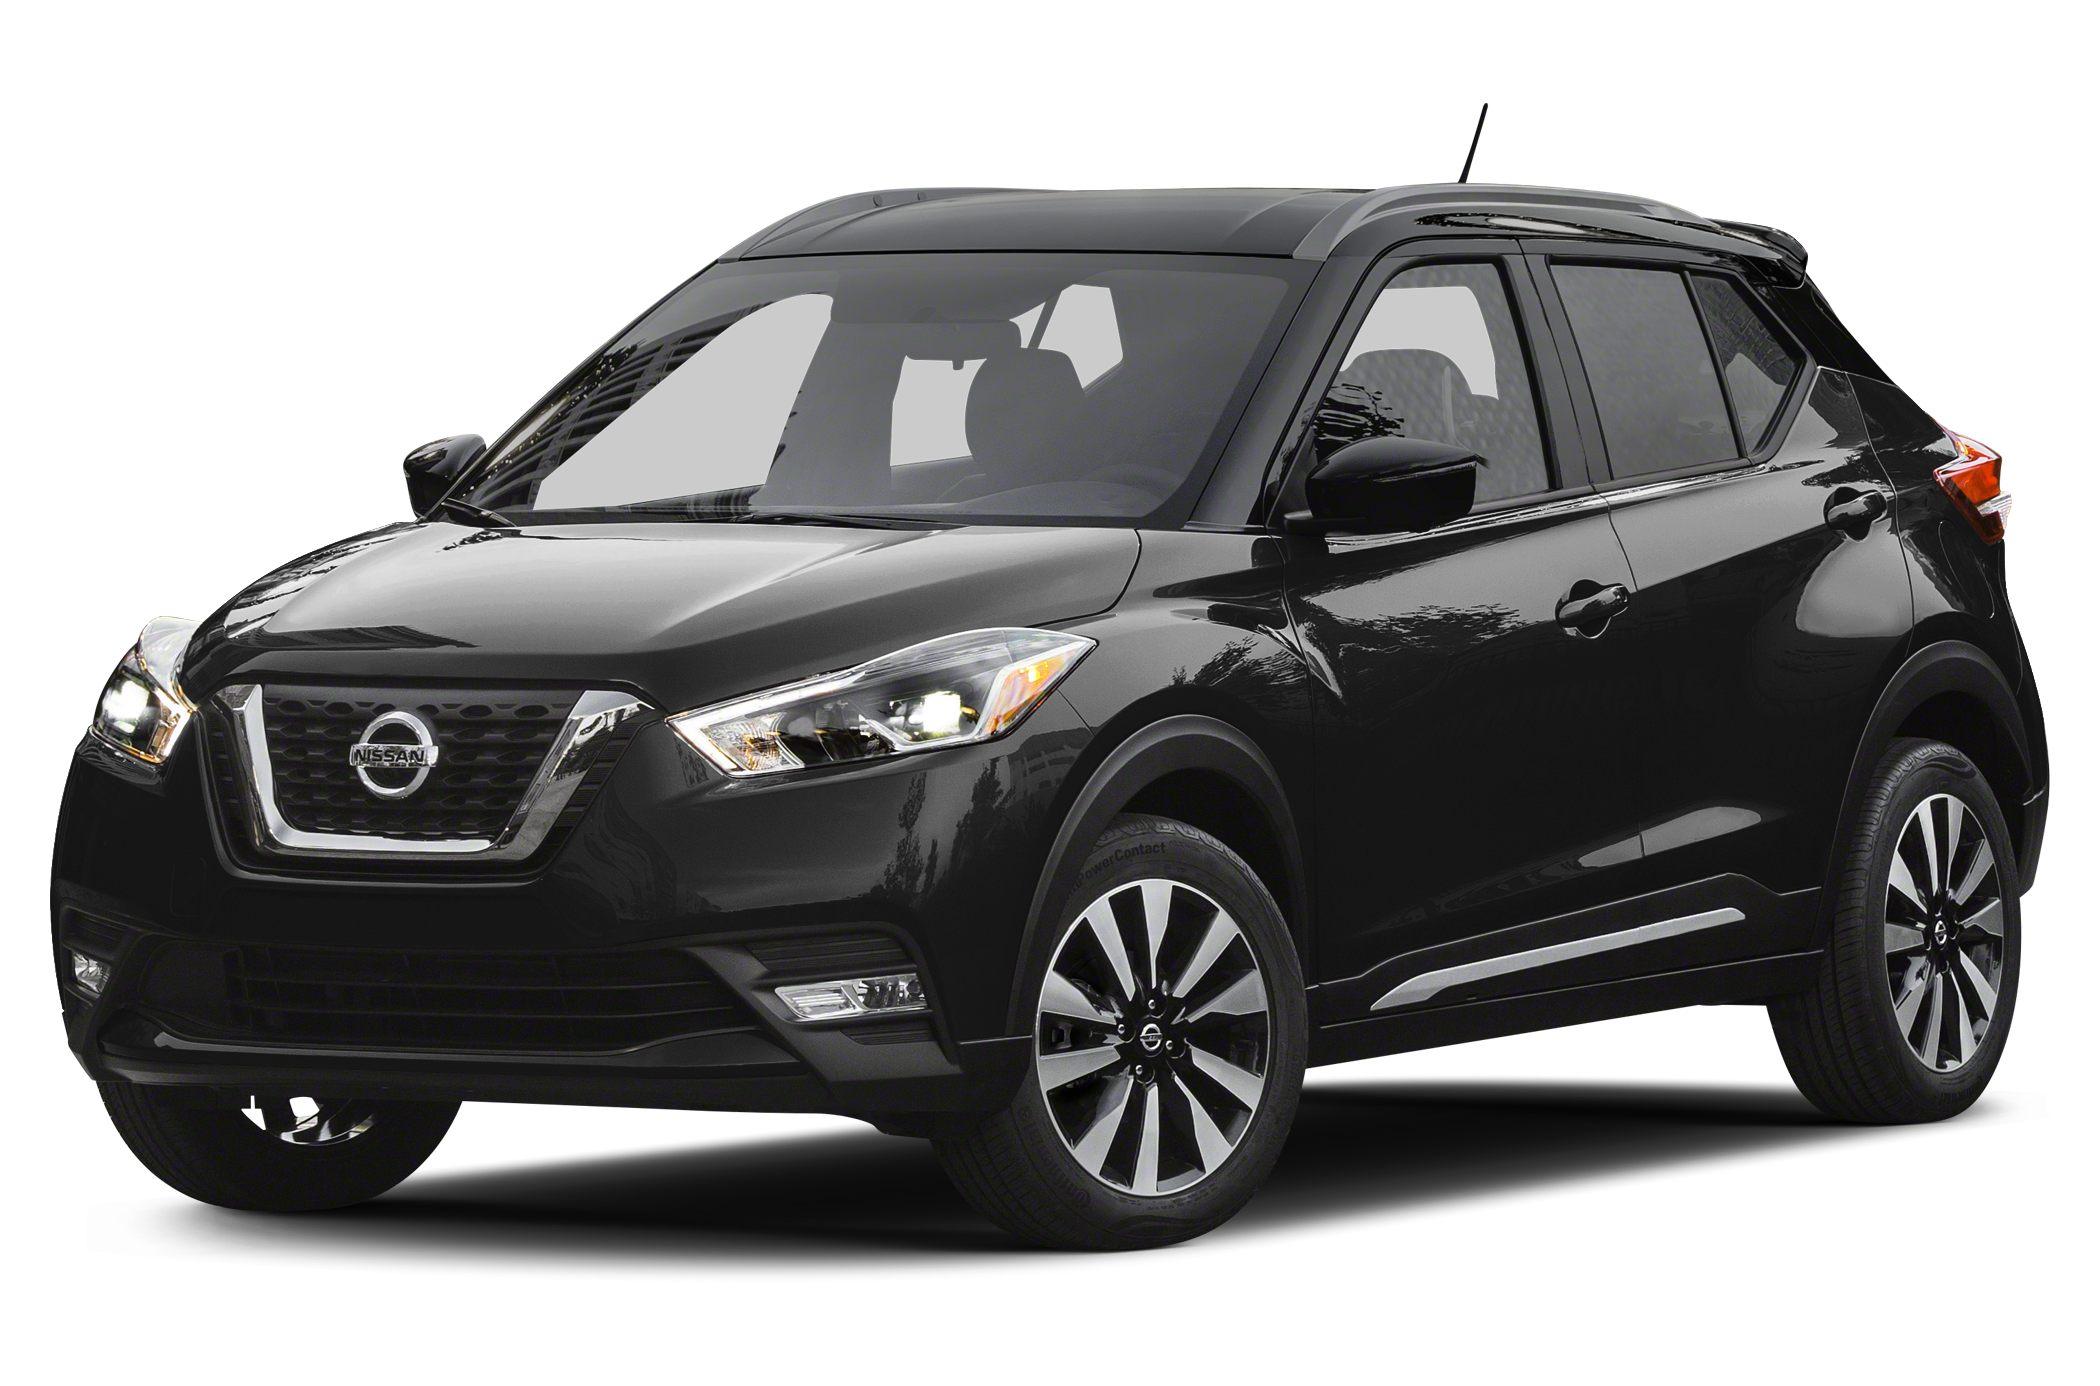 2018 Nissan Kicks Offers Color Studio Customizable Trim